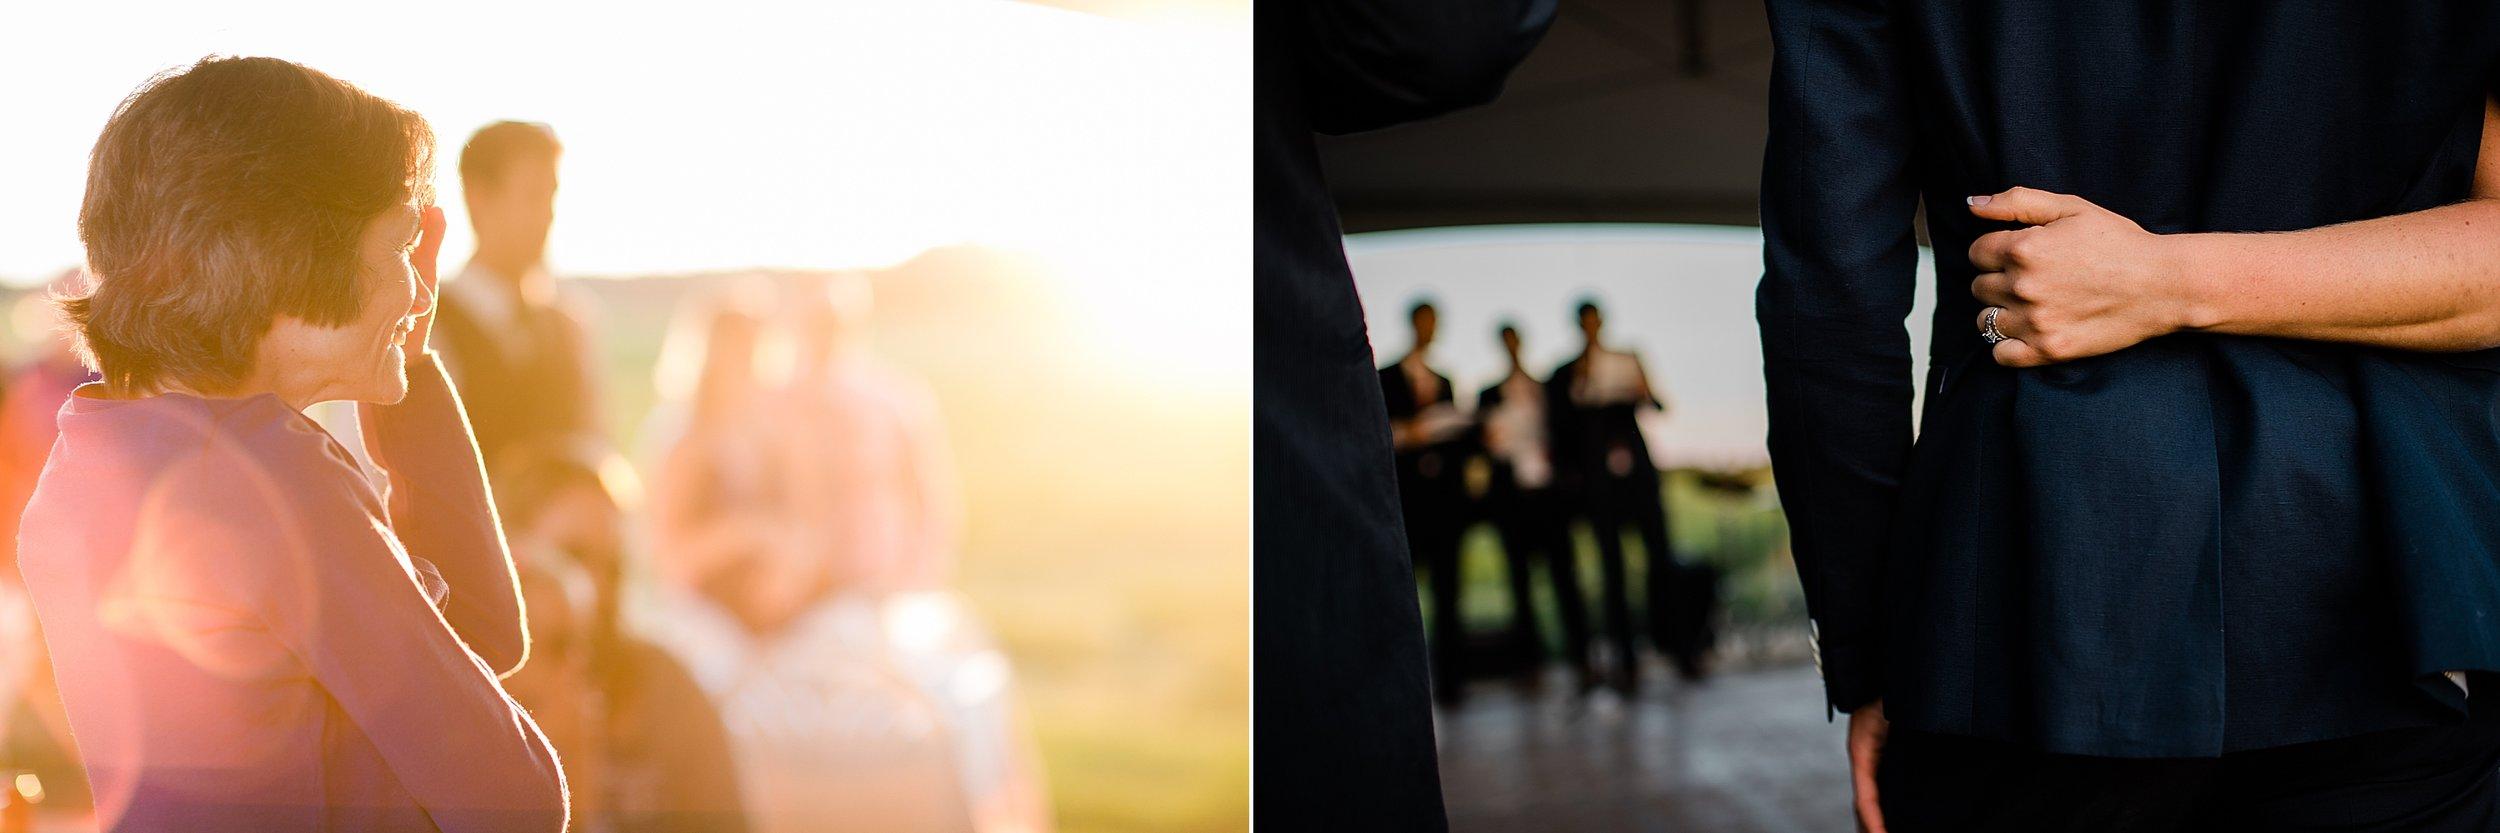 087 los angeles wedding photographer.jpg